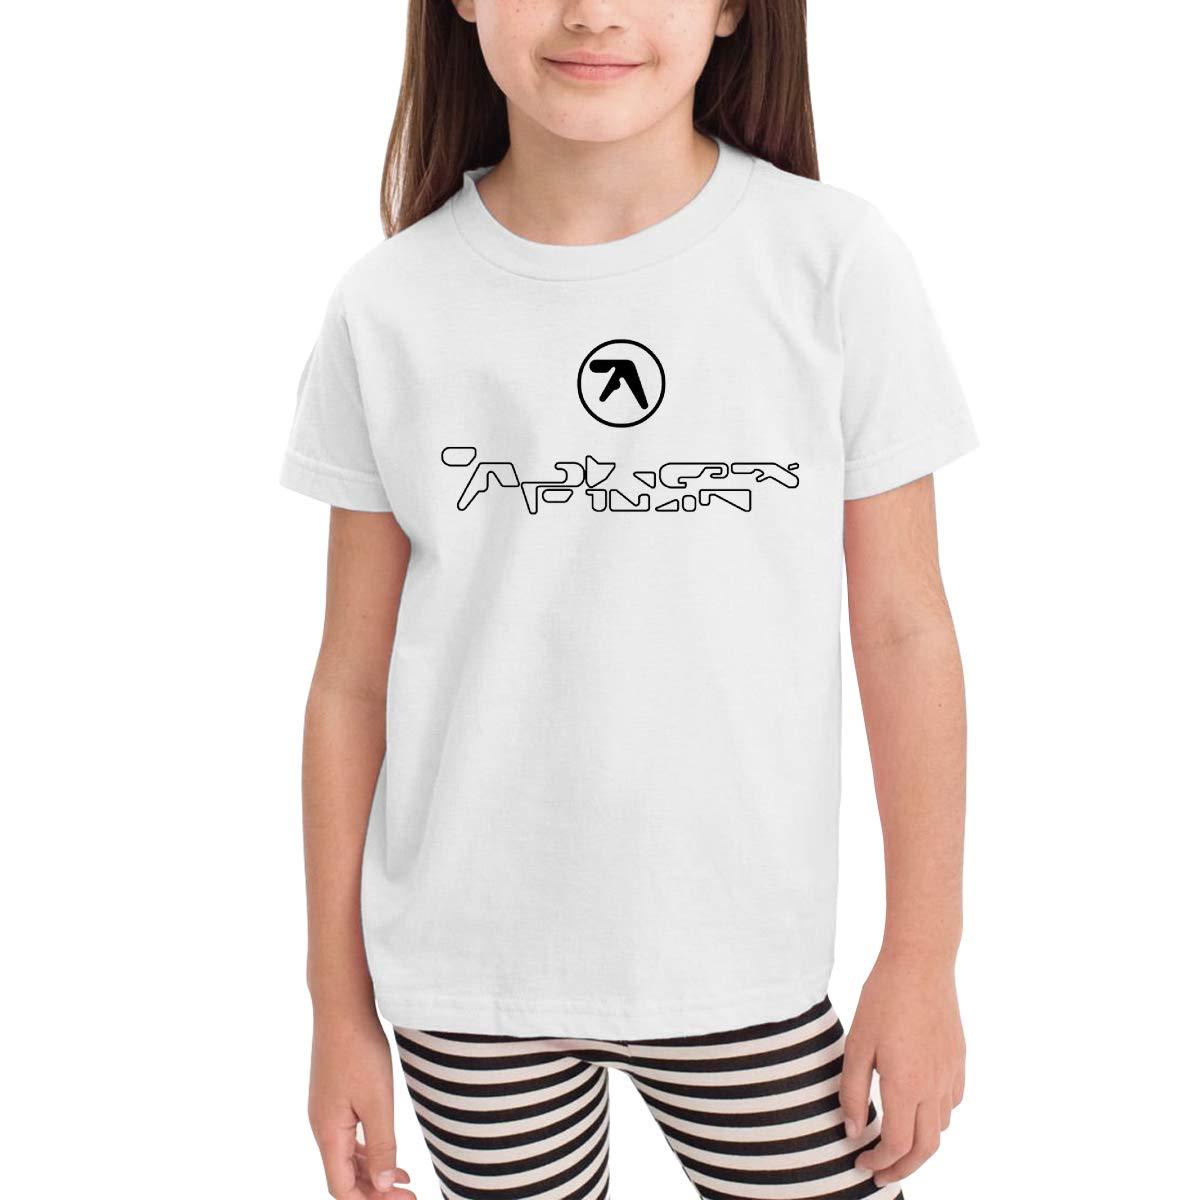 Aphex Twin Logo Unisex Youths Short Sleeve T-Shirt Kids T-Shirt Tops Gray